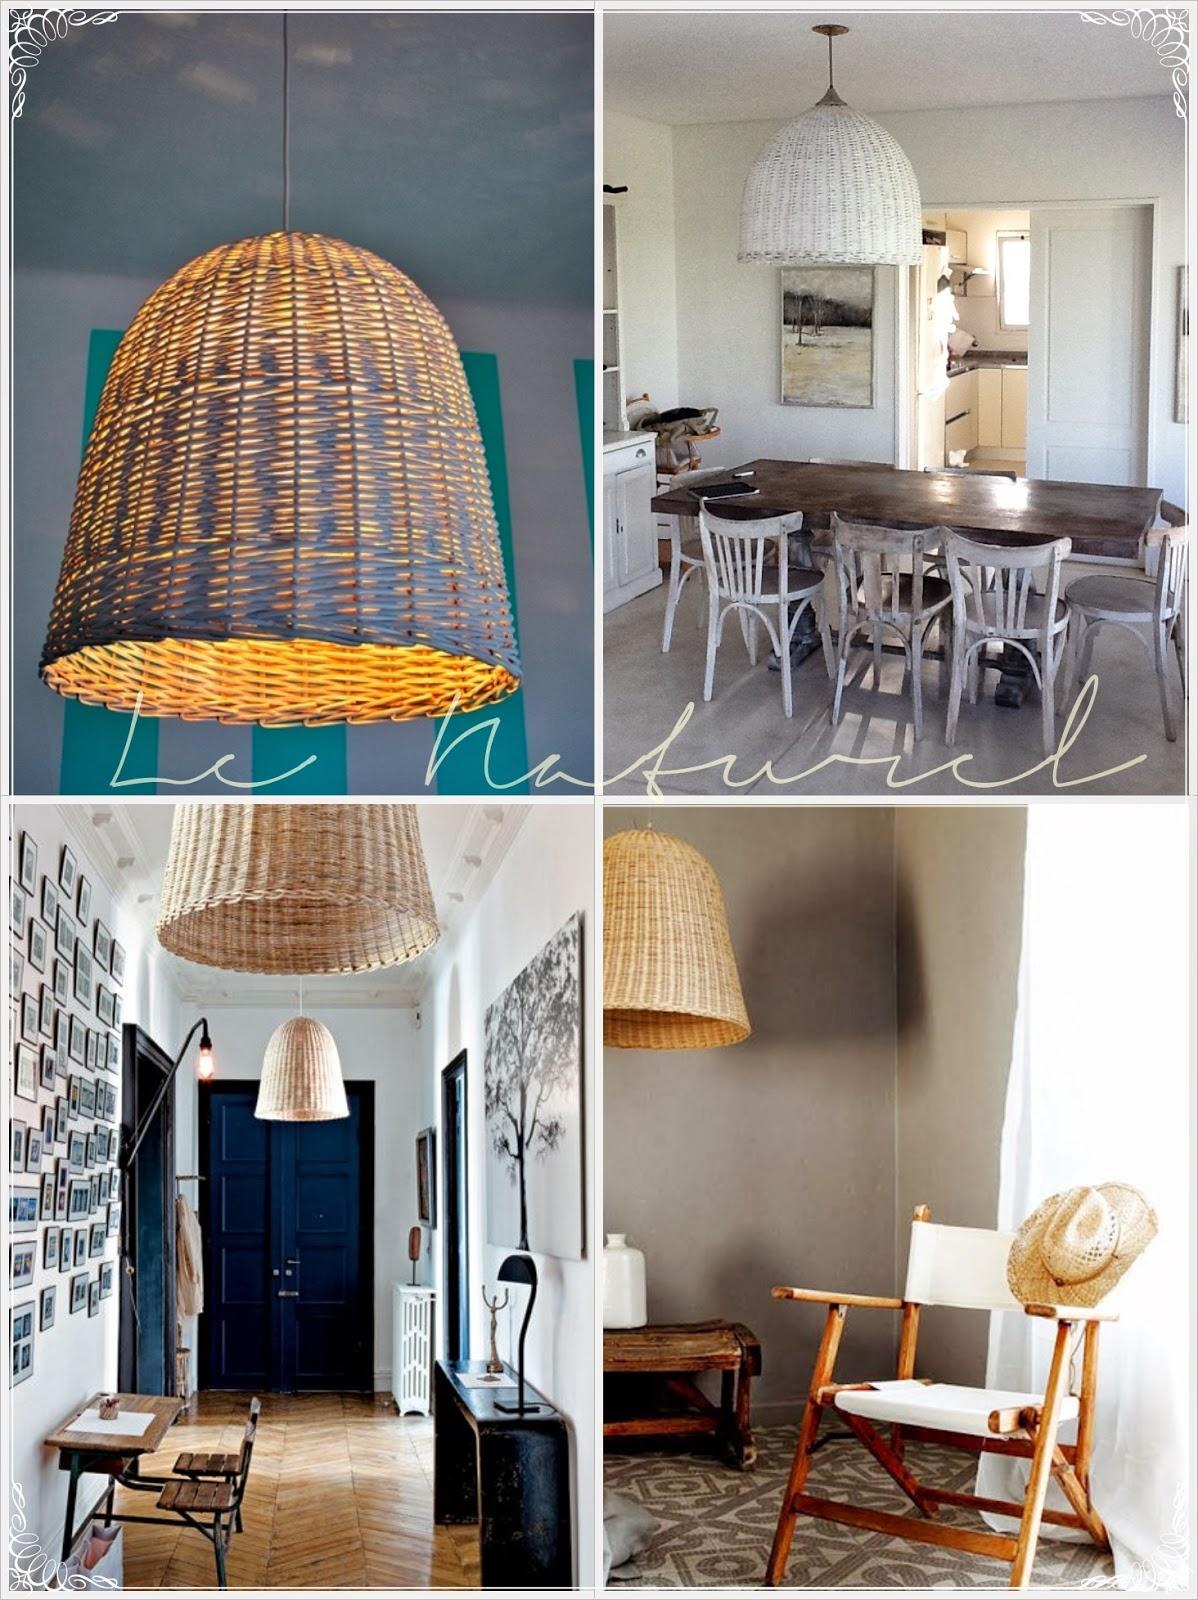 Le naturel almacen de muebles lamparas de mimbre - Lamparas de ambiente ...